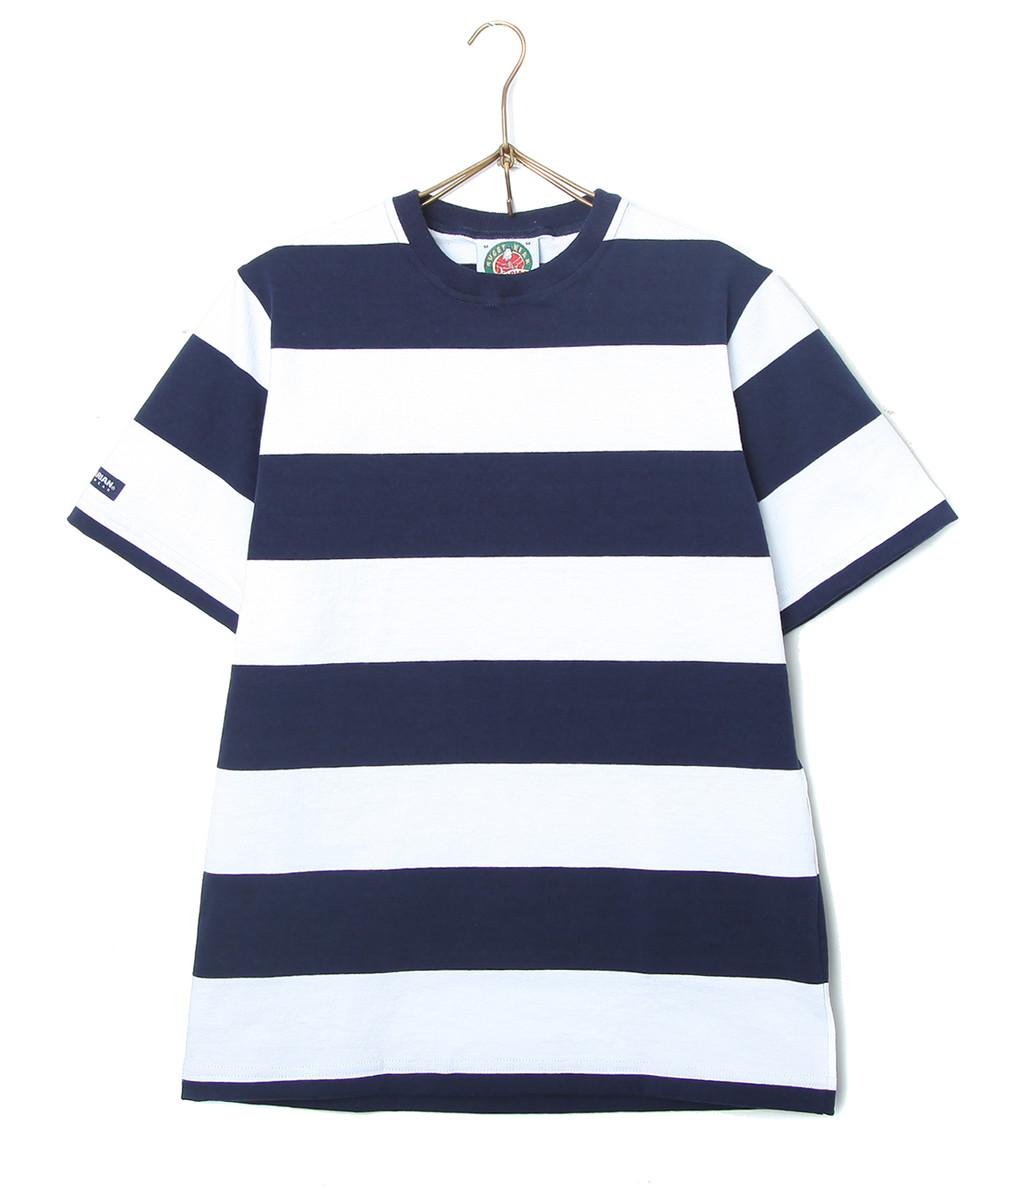 BARBARIAN / バーバリアン : GCNBNC S/S RSE : ティーシャツ 半袖 カットソー メンズ ショートスリーブ : 1534803-RSE-13-rea 【REA】